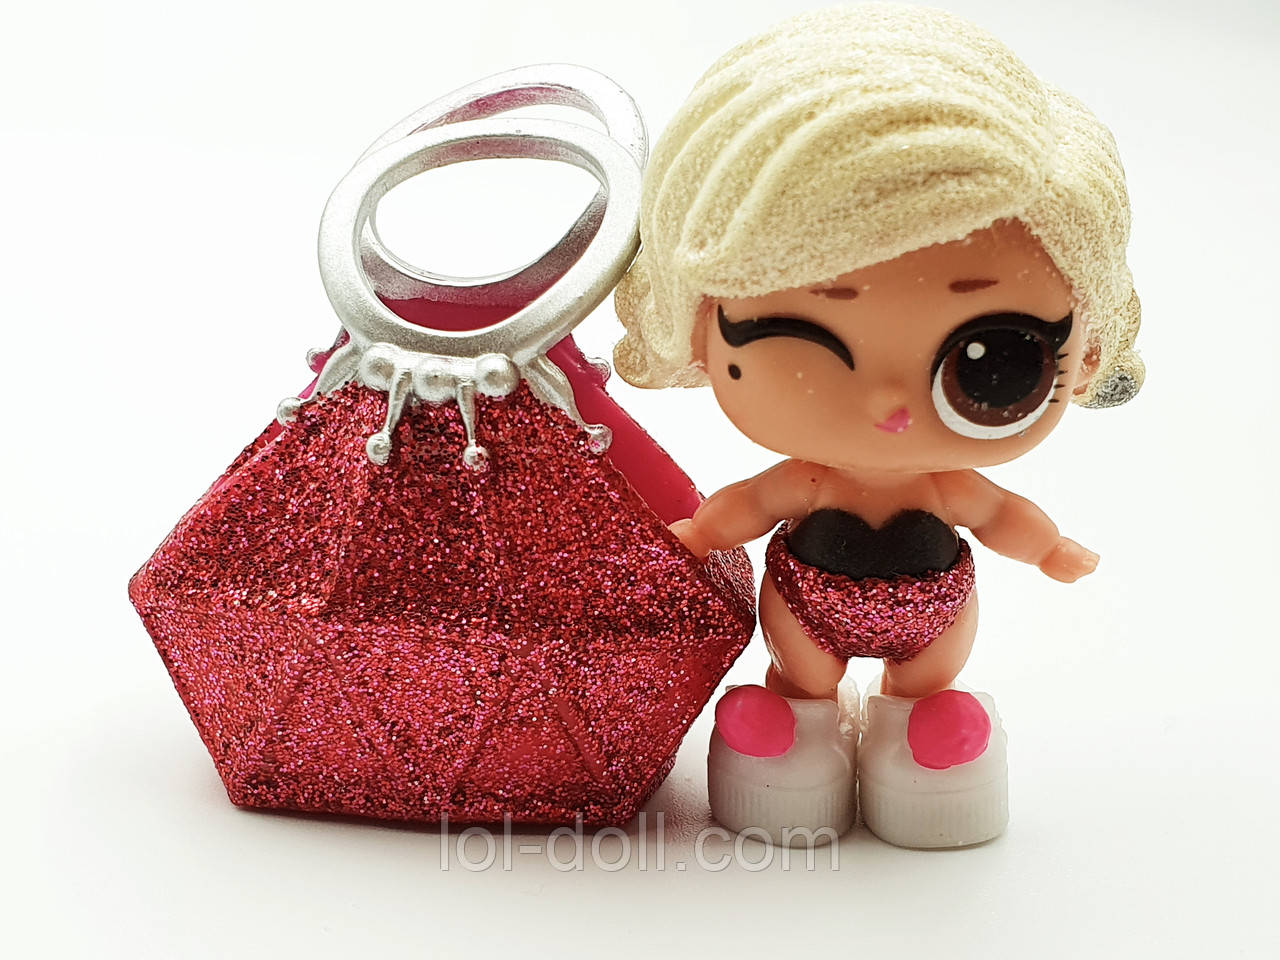 Кукла LOL Surprise Winter Disco Lil`s Lil Glamour Queen - Мадонна Лол Сюрприз Без Шара Оригинал